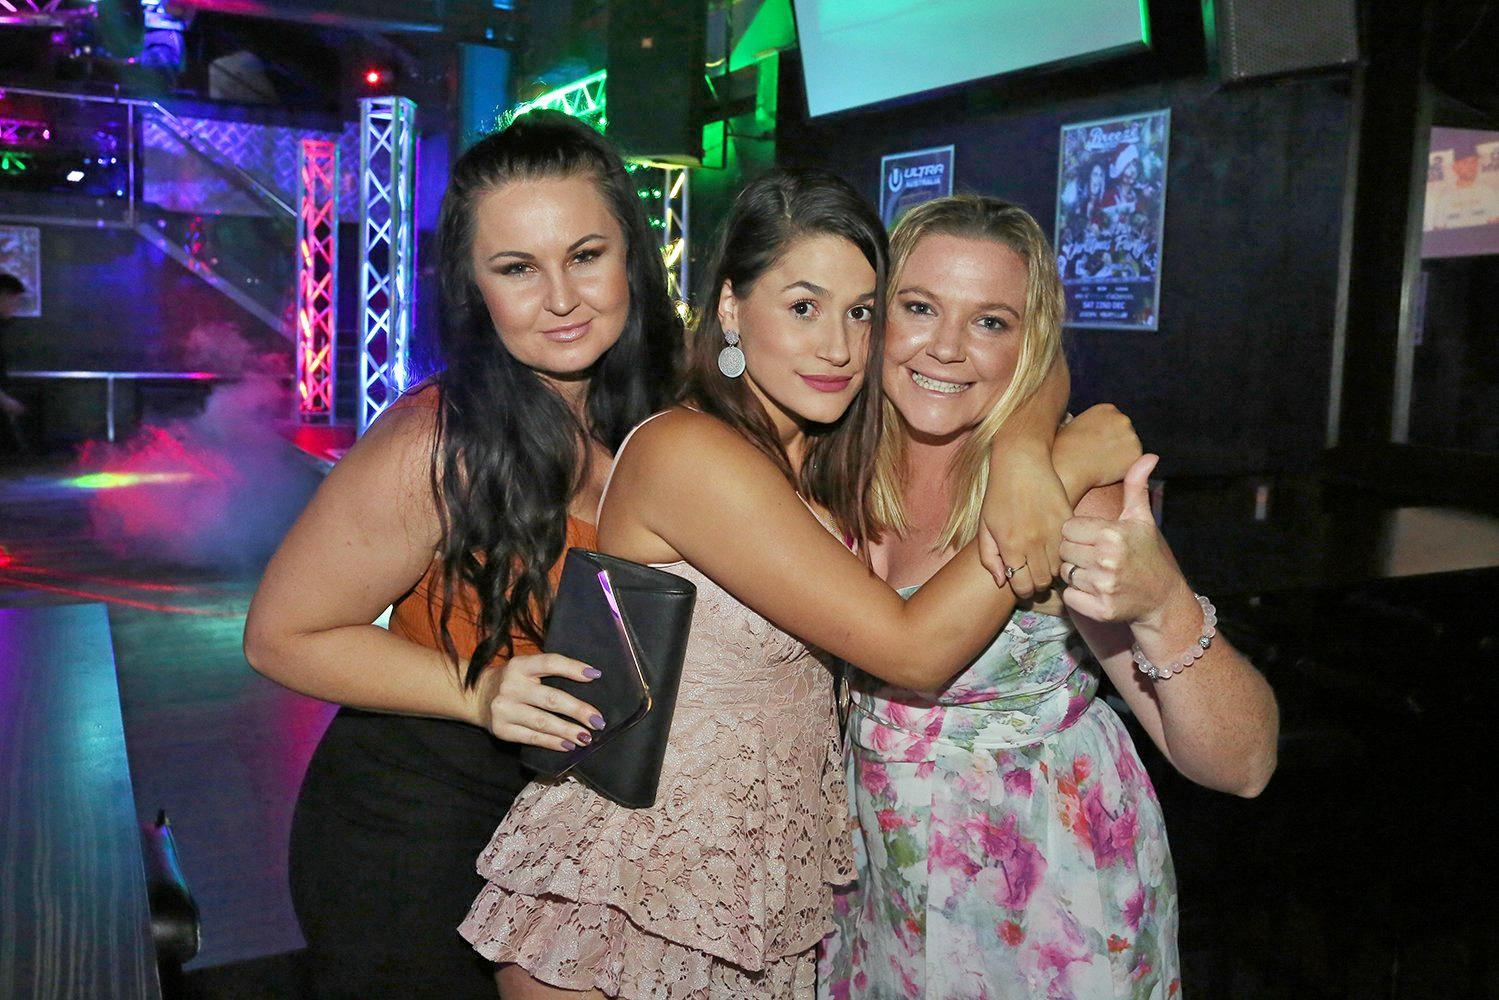 L-R Brenna Willmott, Jessica Hughes and Khala Smithson at Zodiac Nightclub.